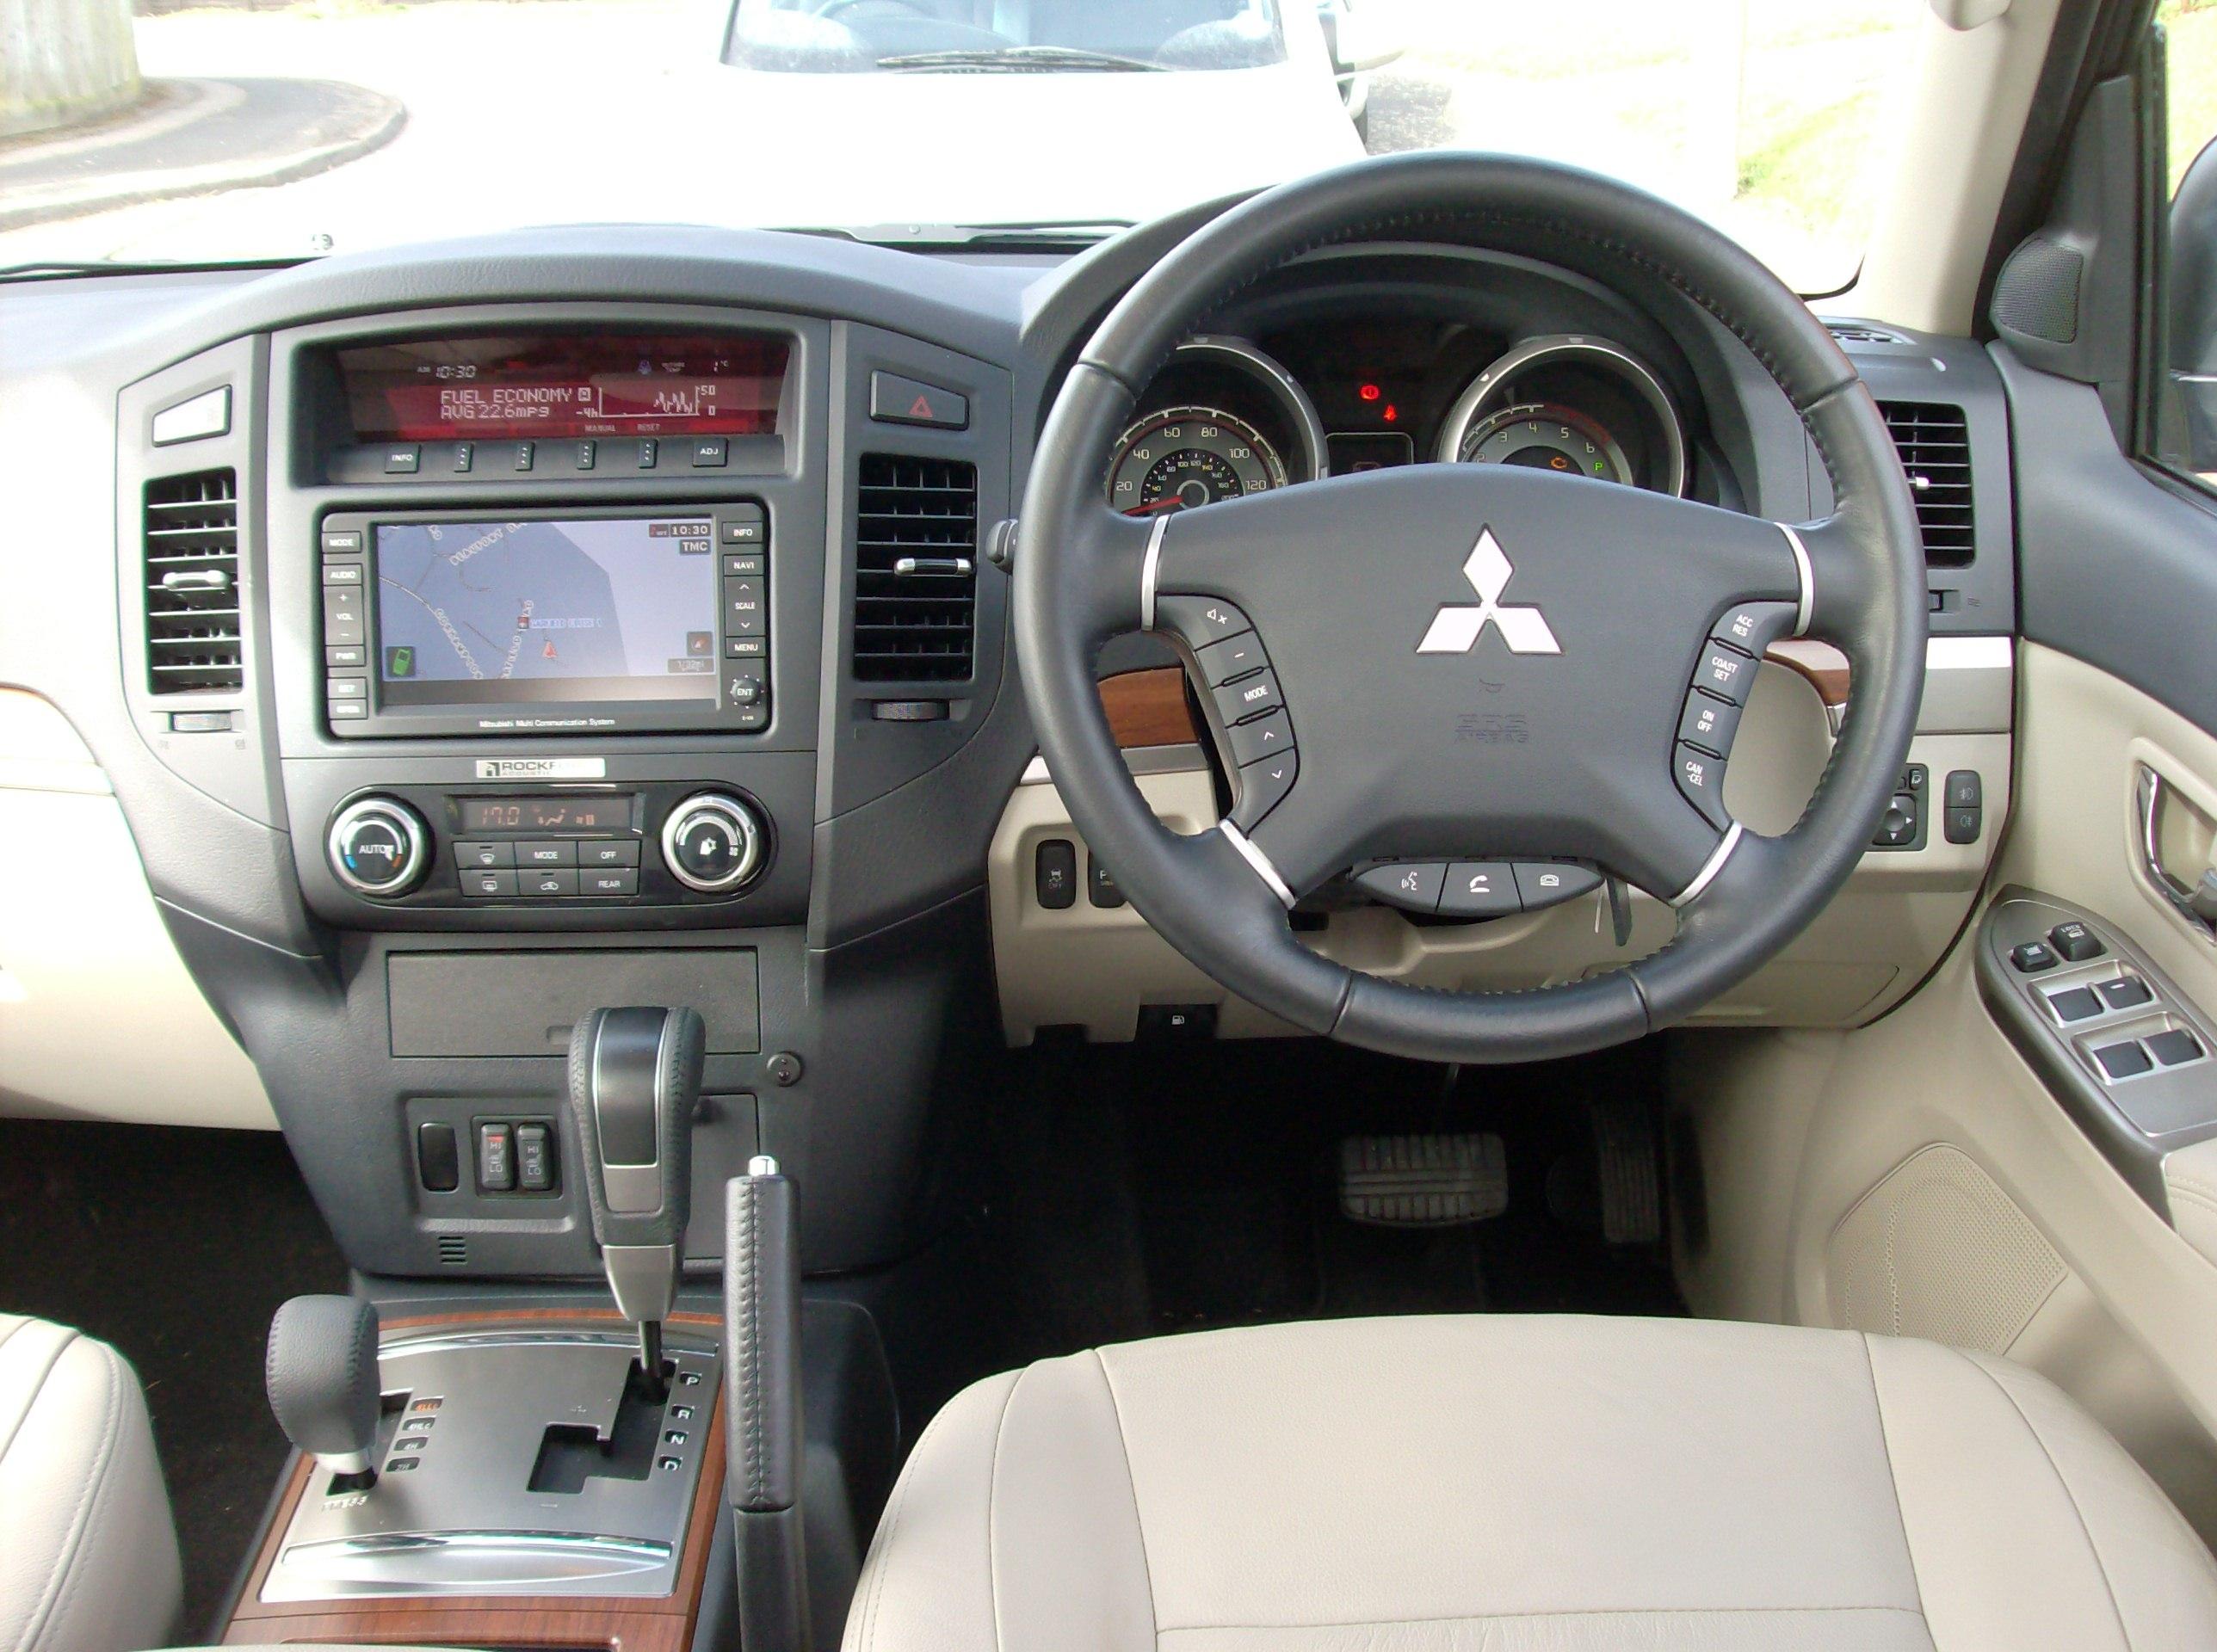 Mitsubishi Shogun Computer Backgrounds